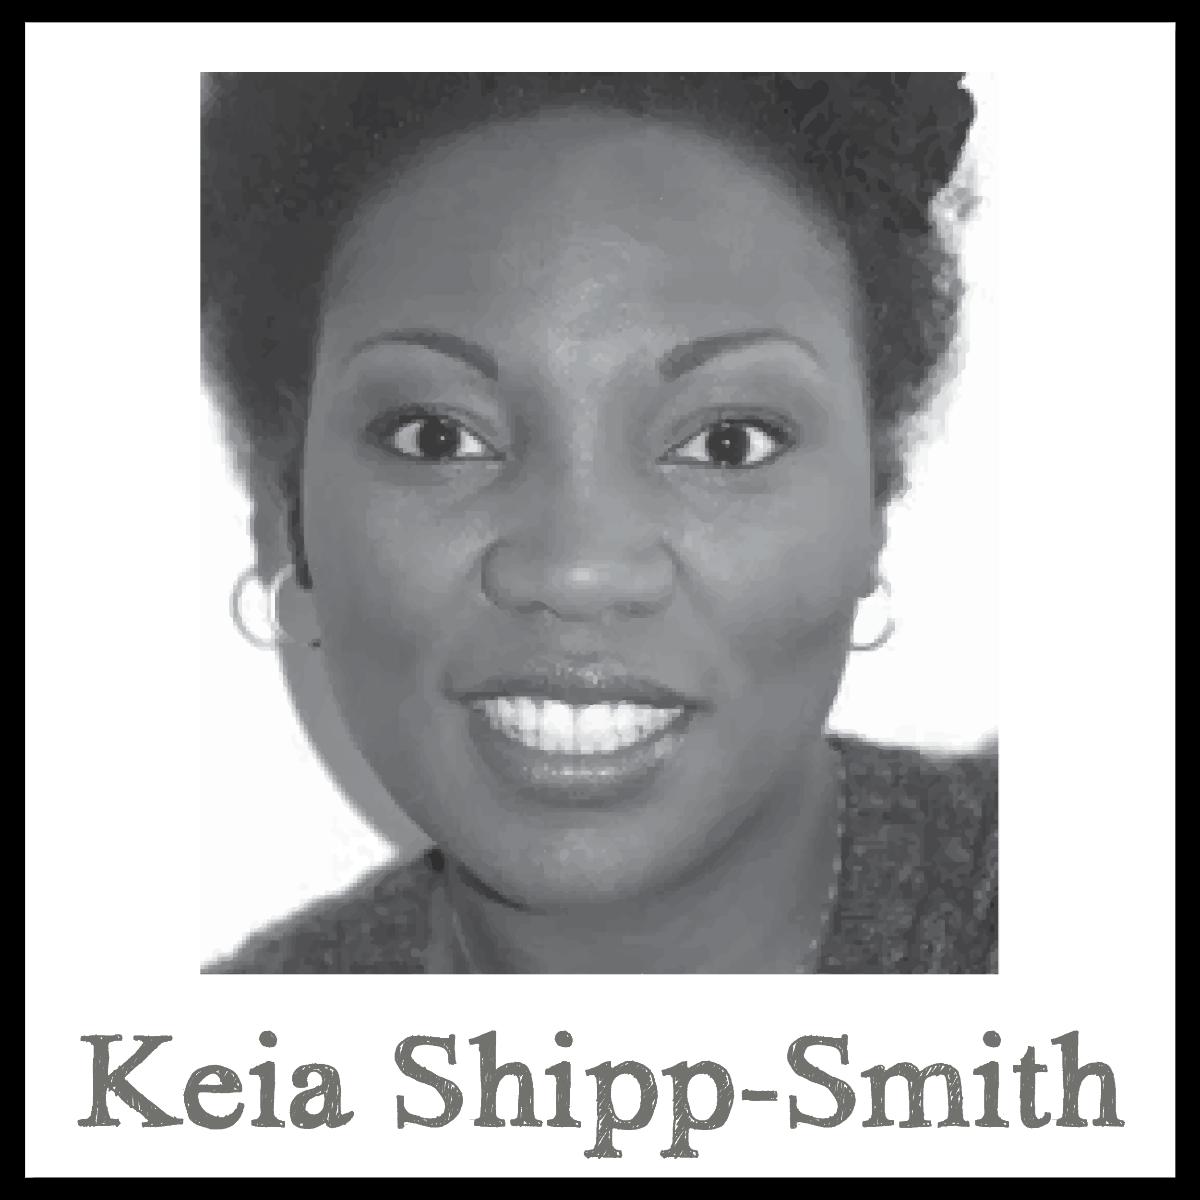 Keia Shipp-Smith